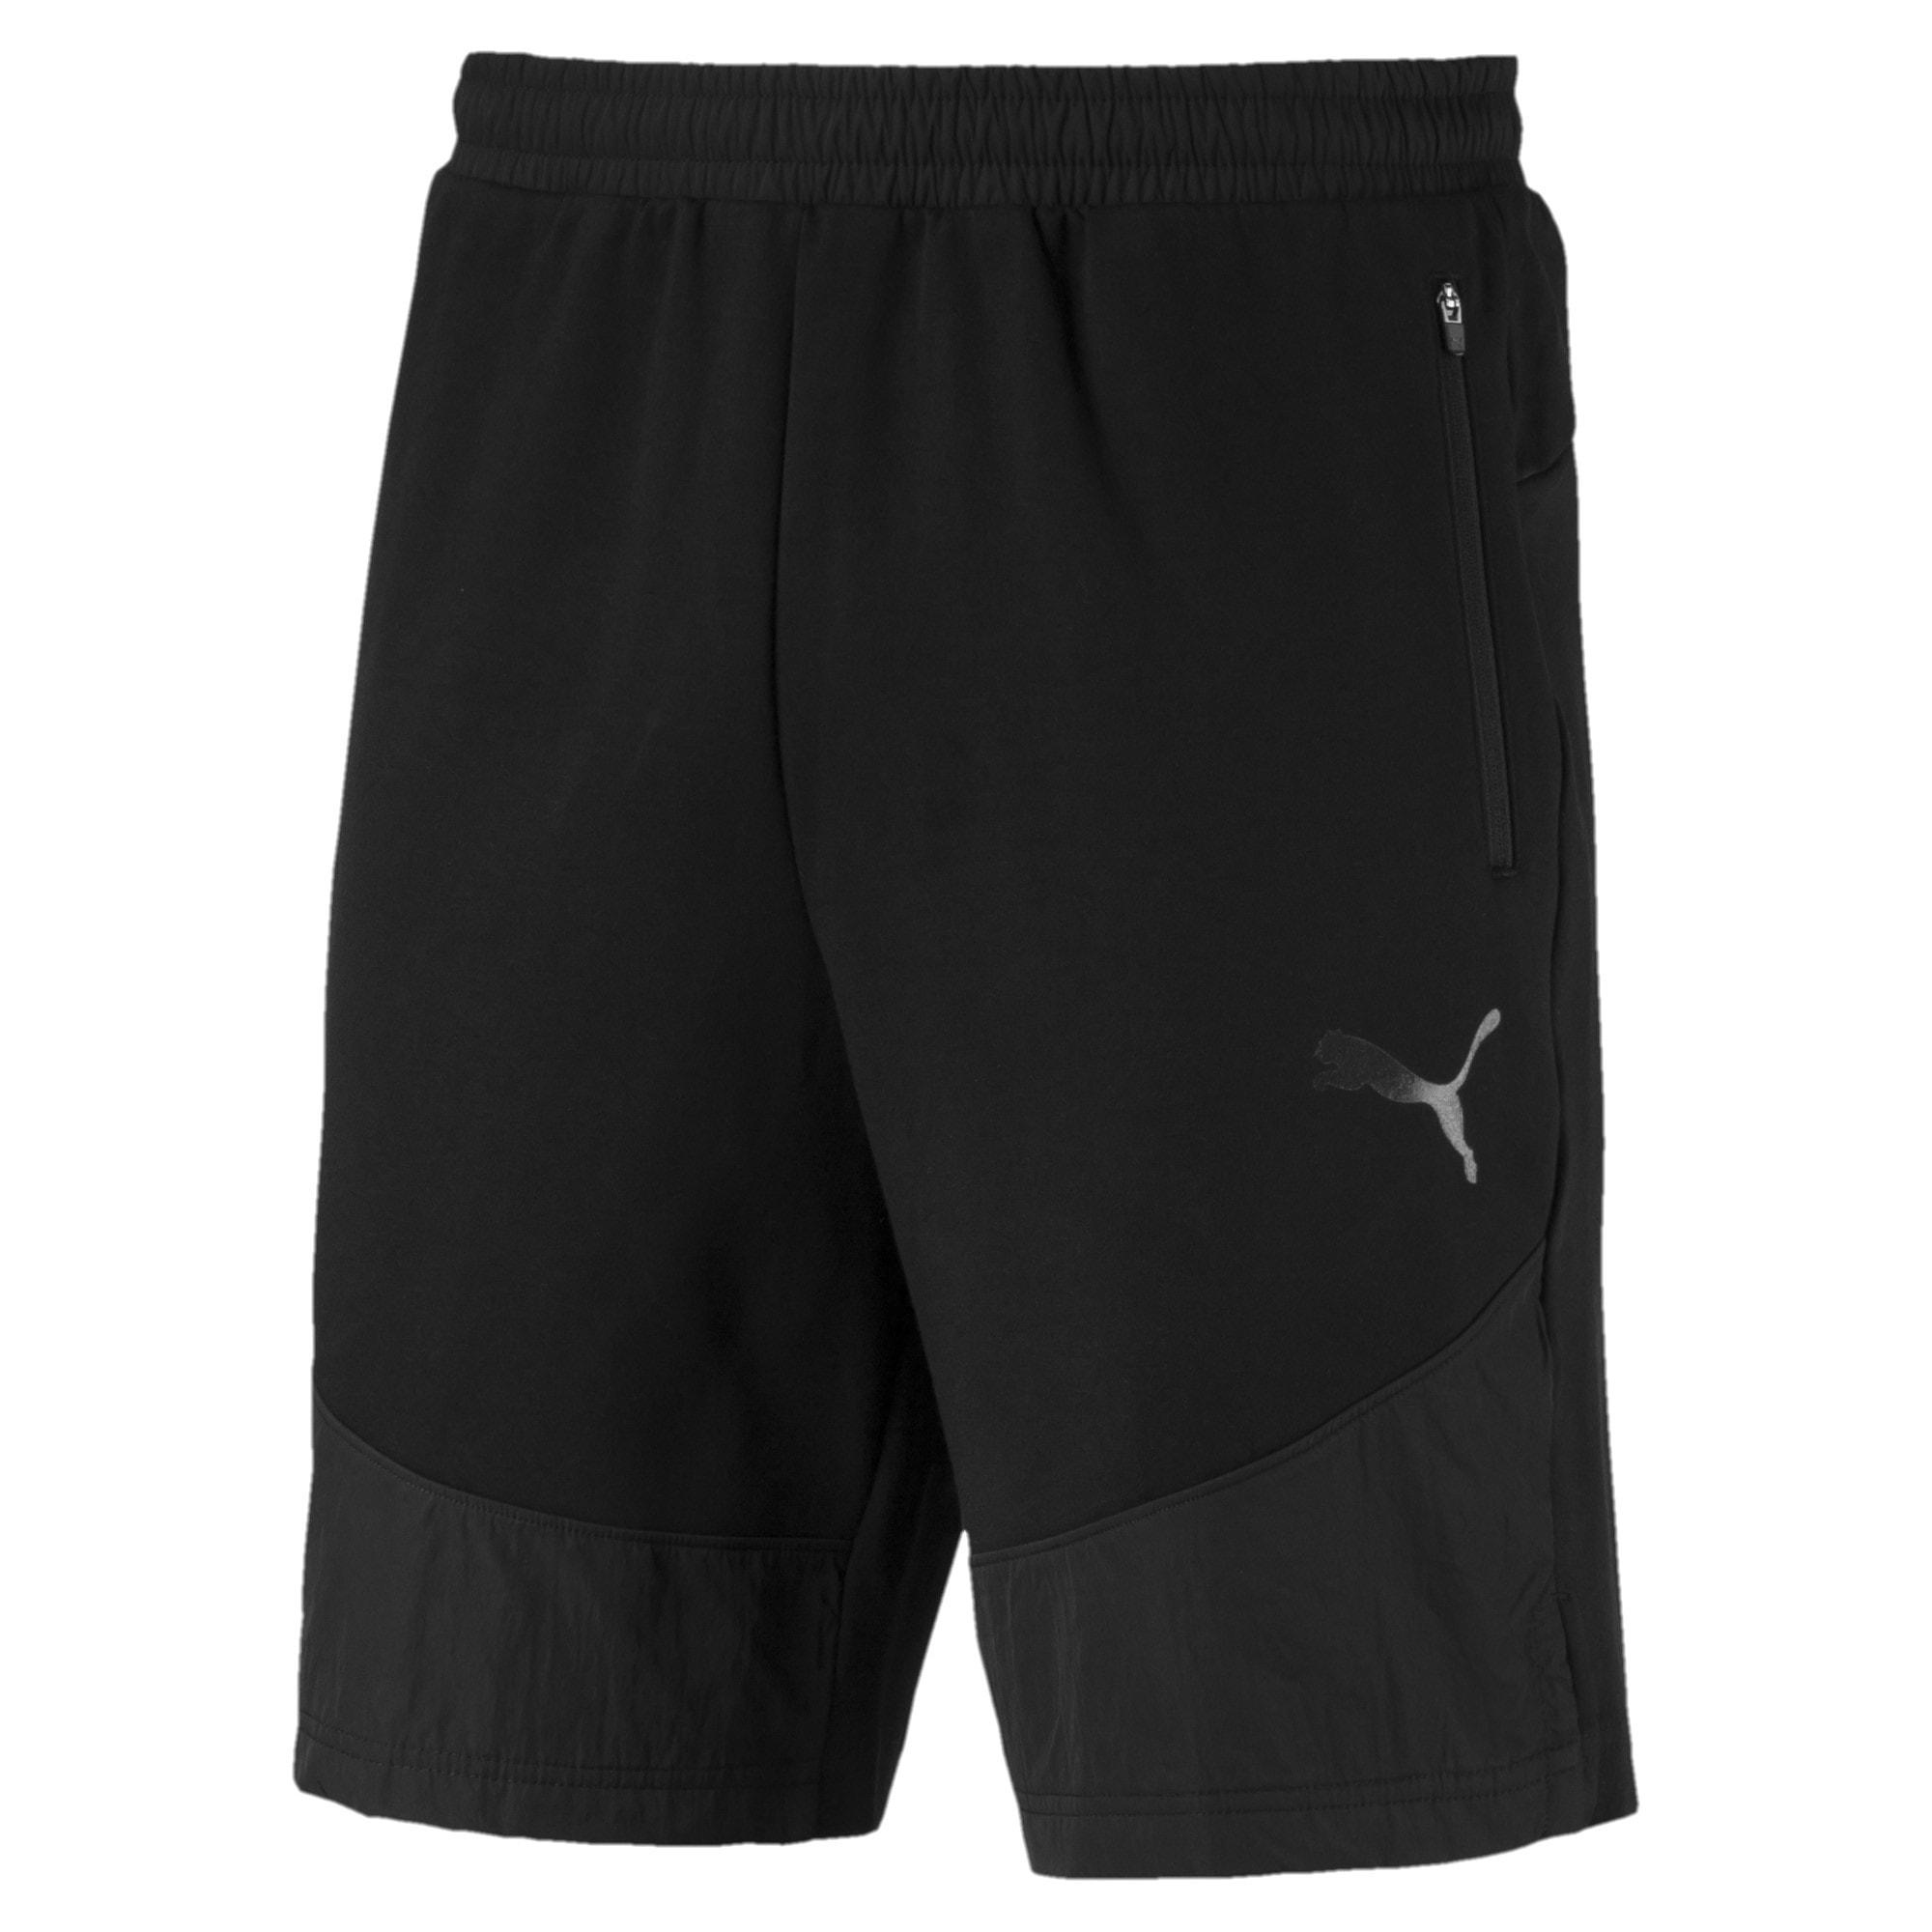 Thumbnail 4 of Evostripe Lite Men's Shorts, Puma Black, medium